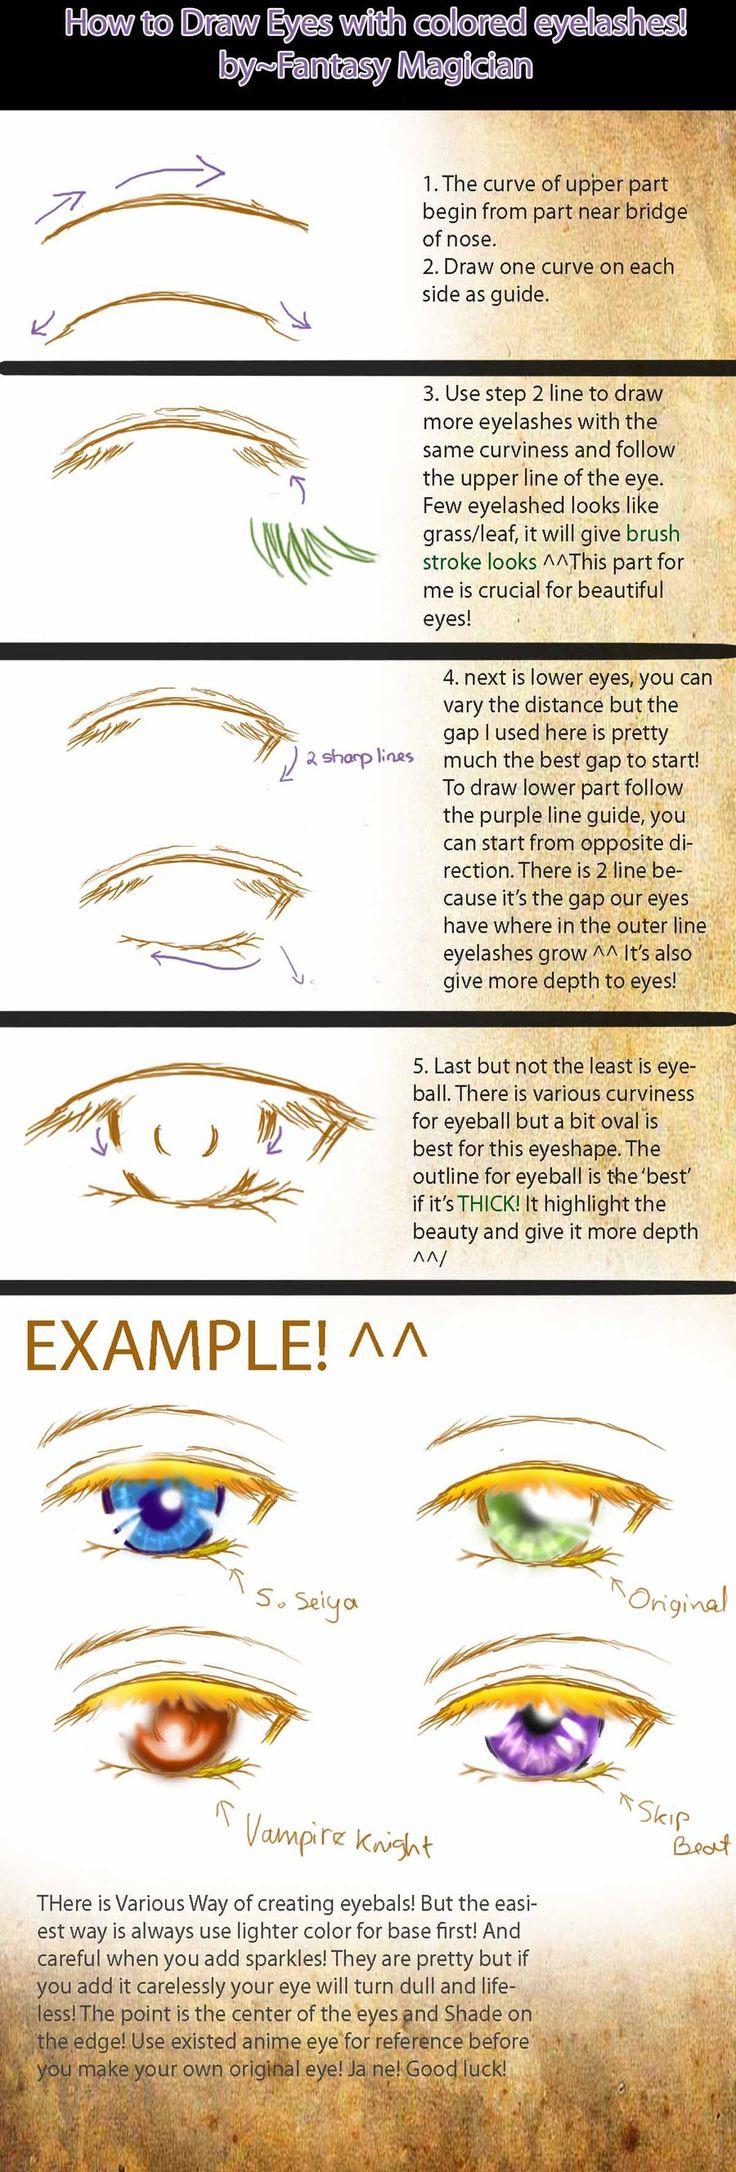 How to Draw Pretty Eyes by Fantasy-Magician.deviantart.com on @DeviantArt